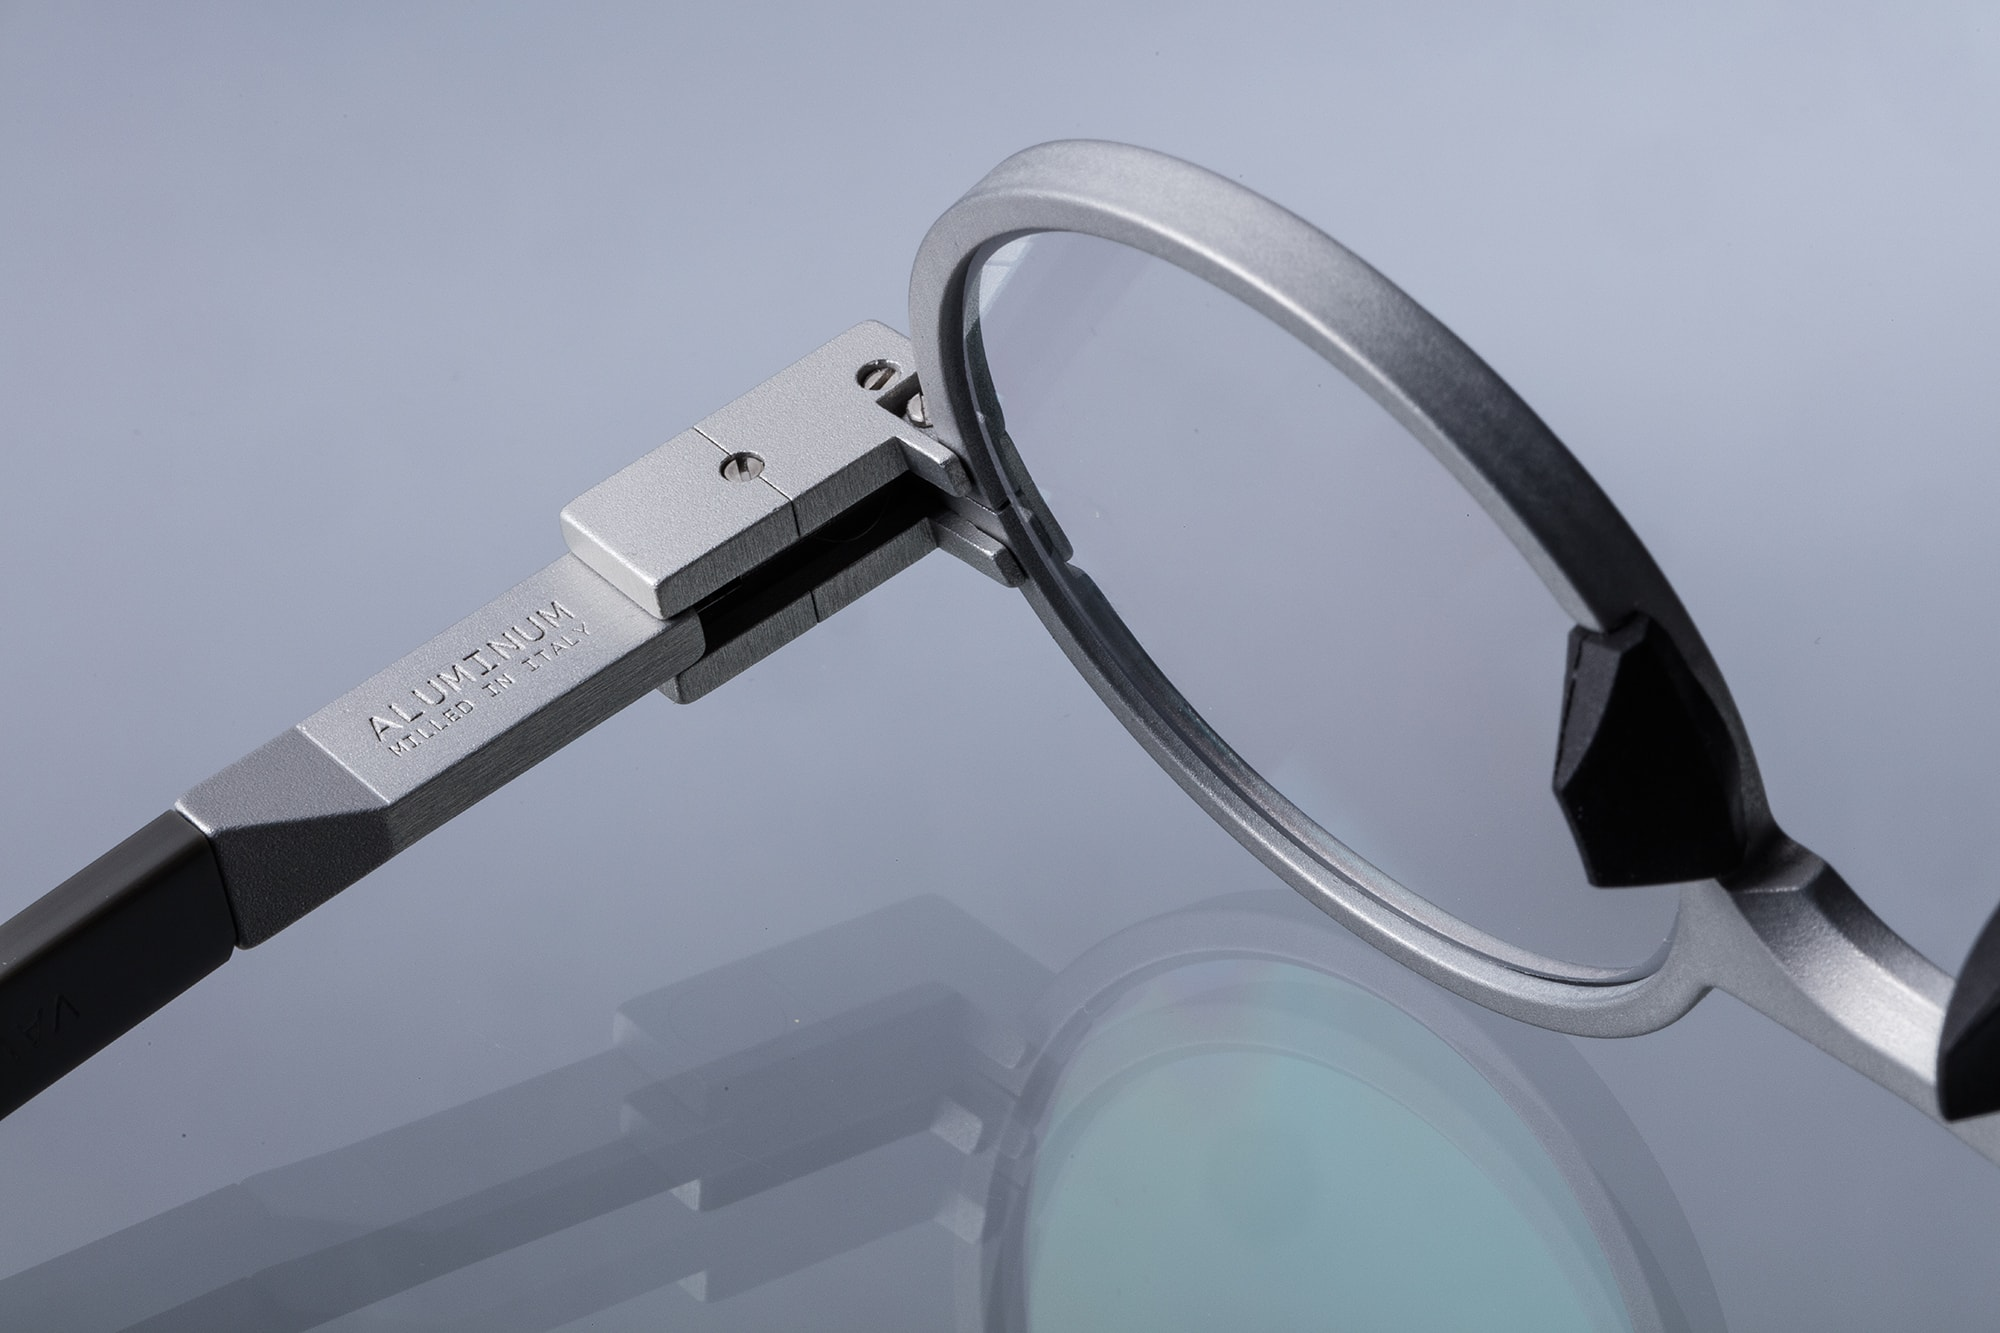 vava eyewear details of wl0012 silver